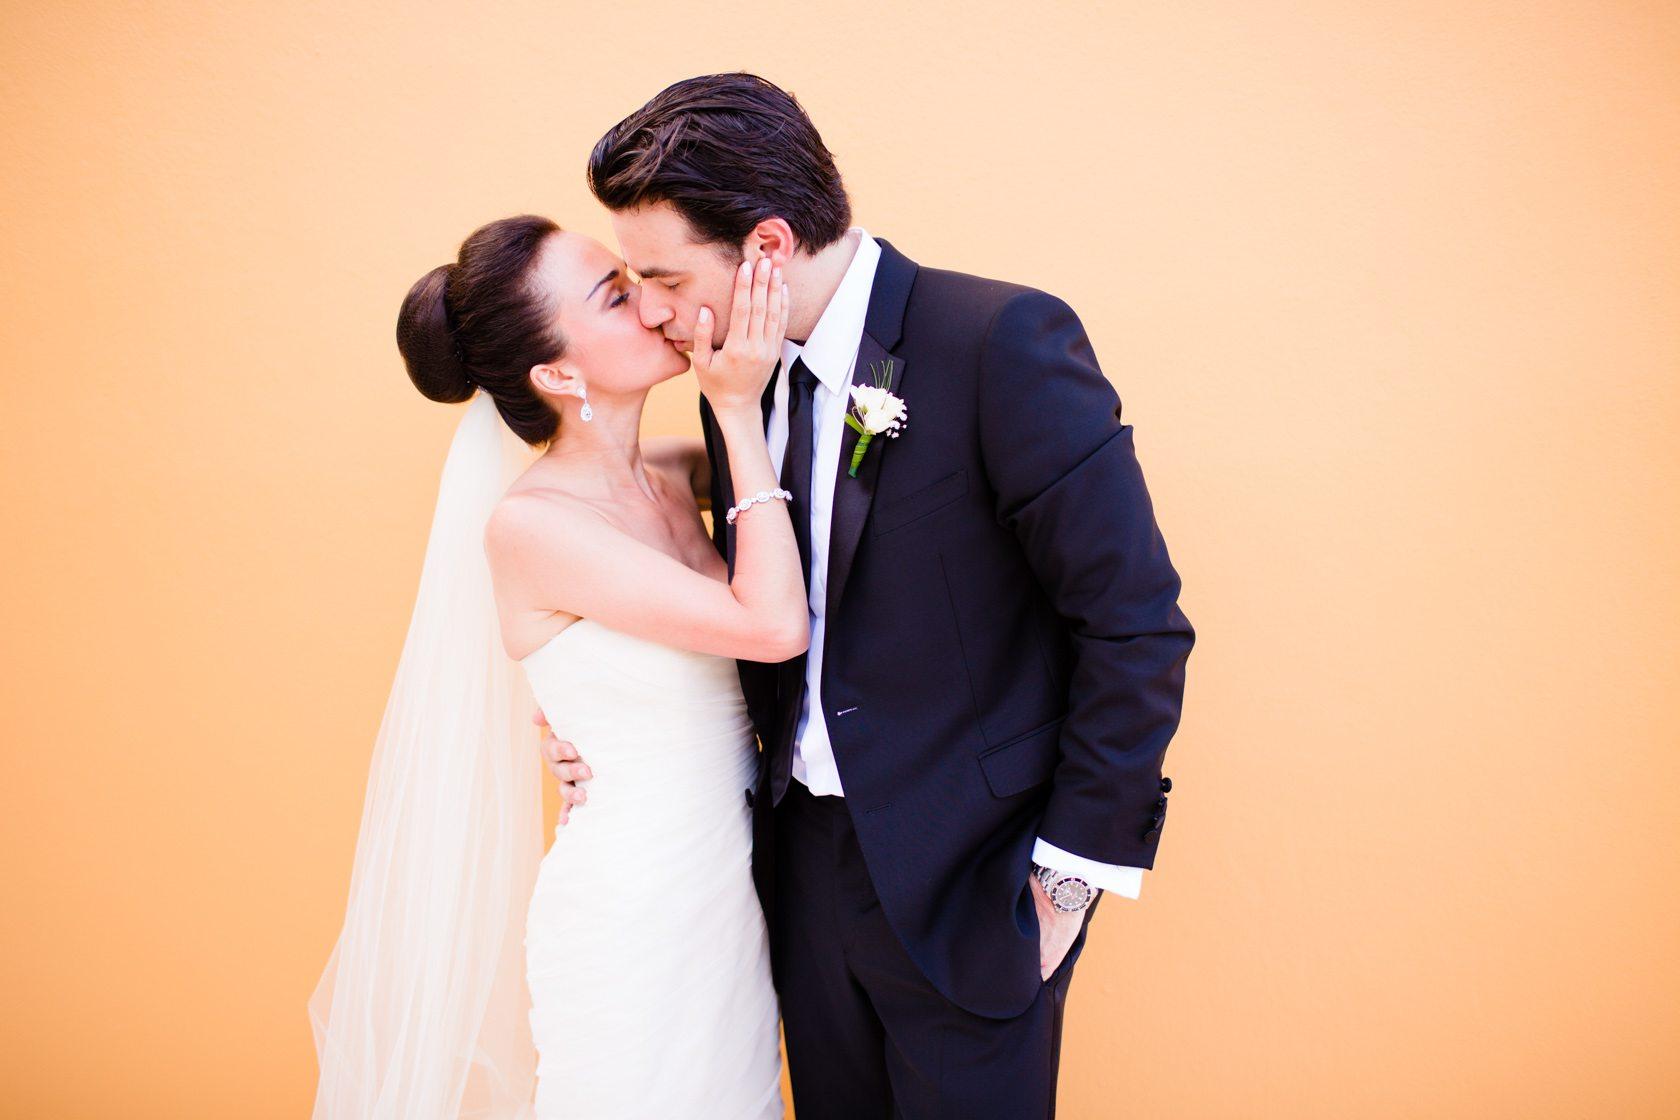 Fairmont_Mayakoba_Wedding_035.jpg